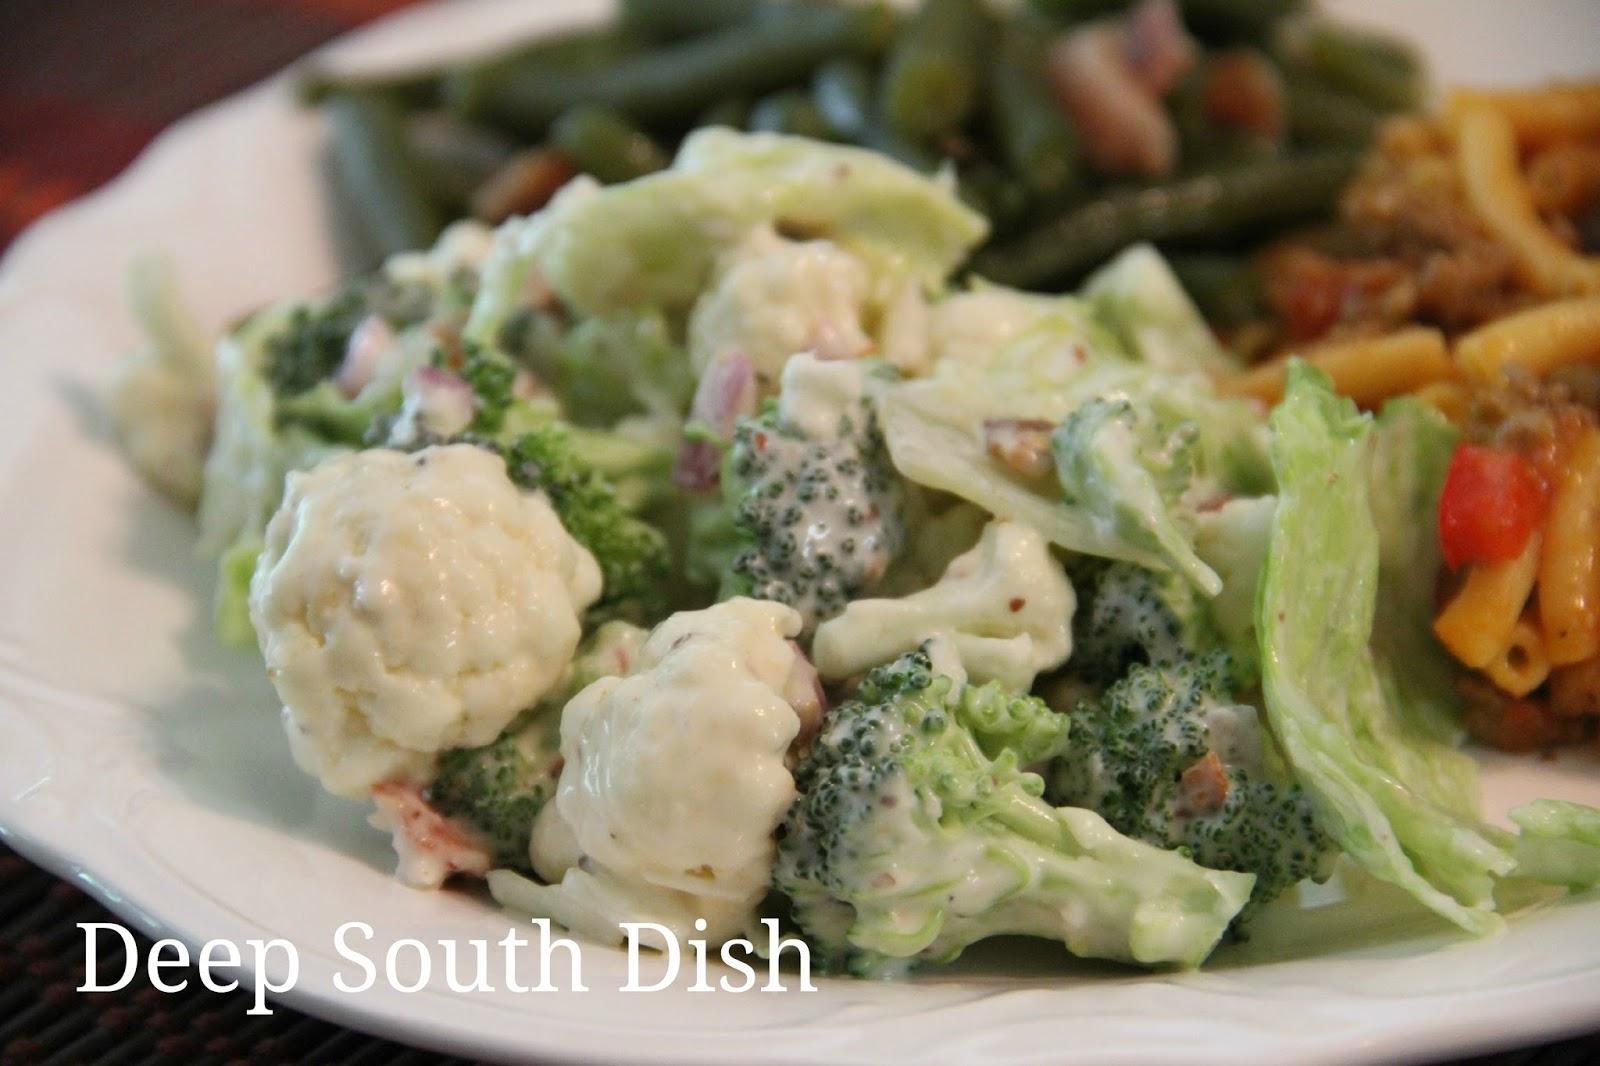 Deep South Dish Next Day Salad